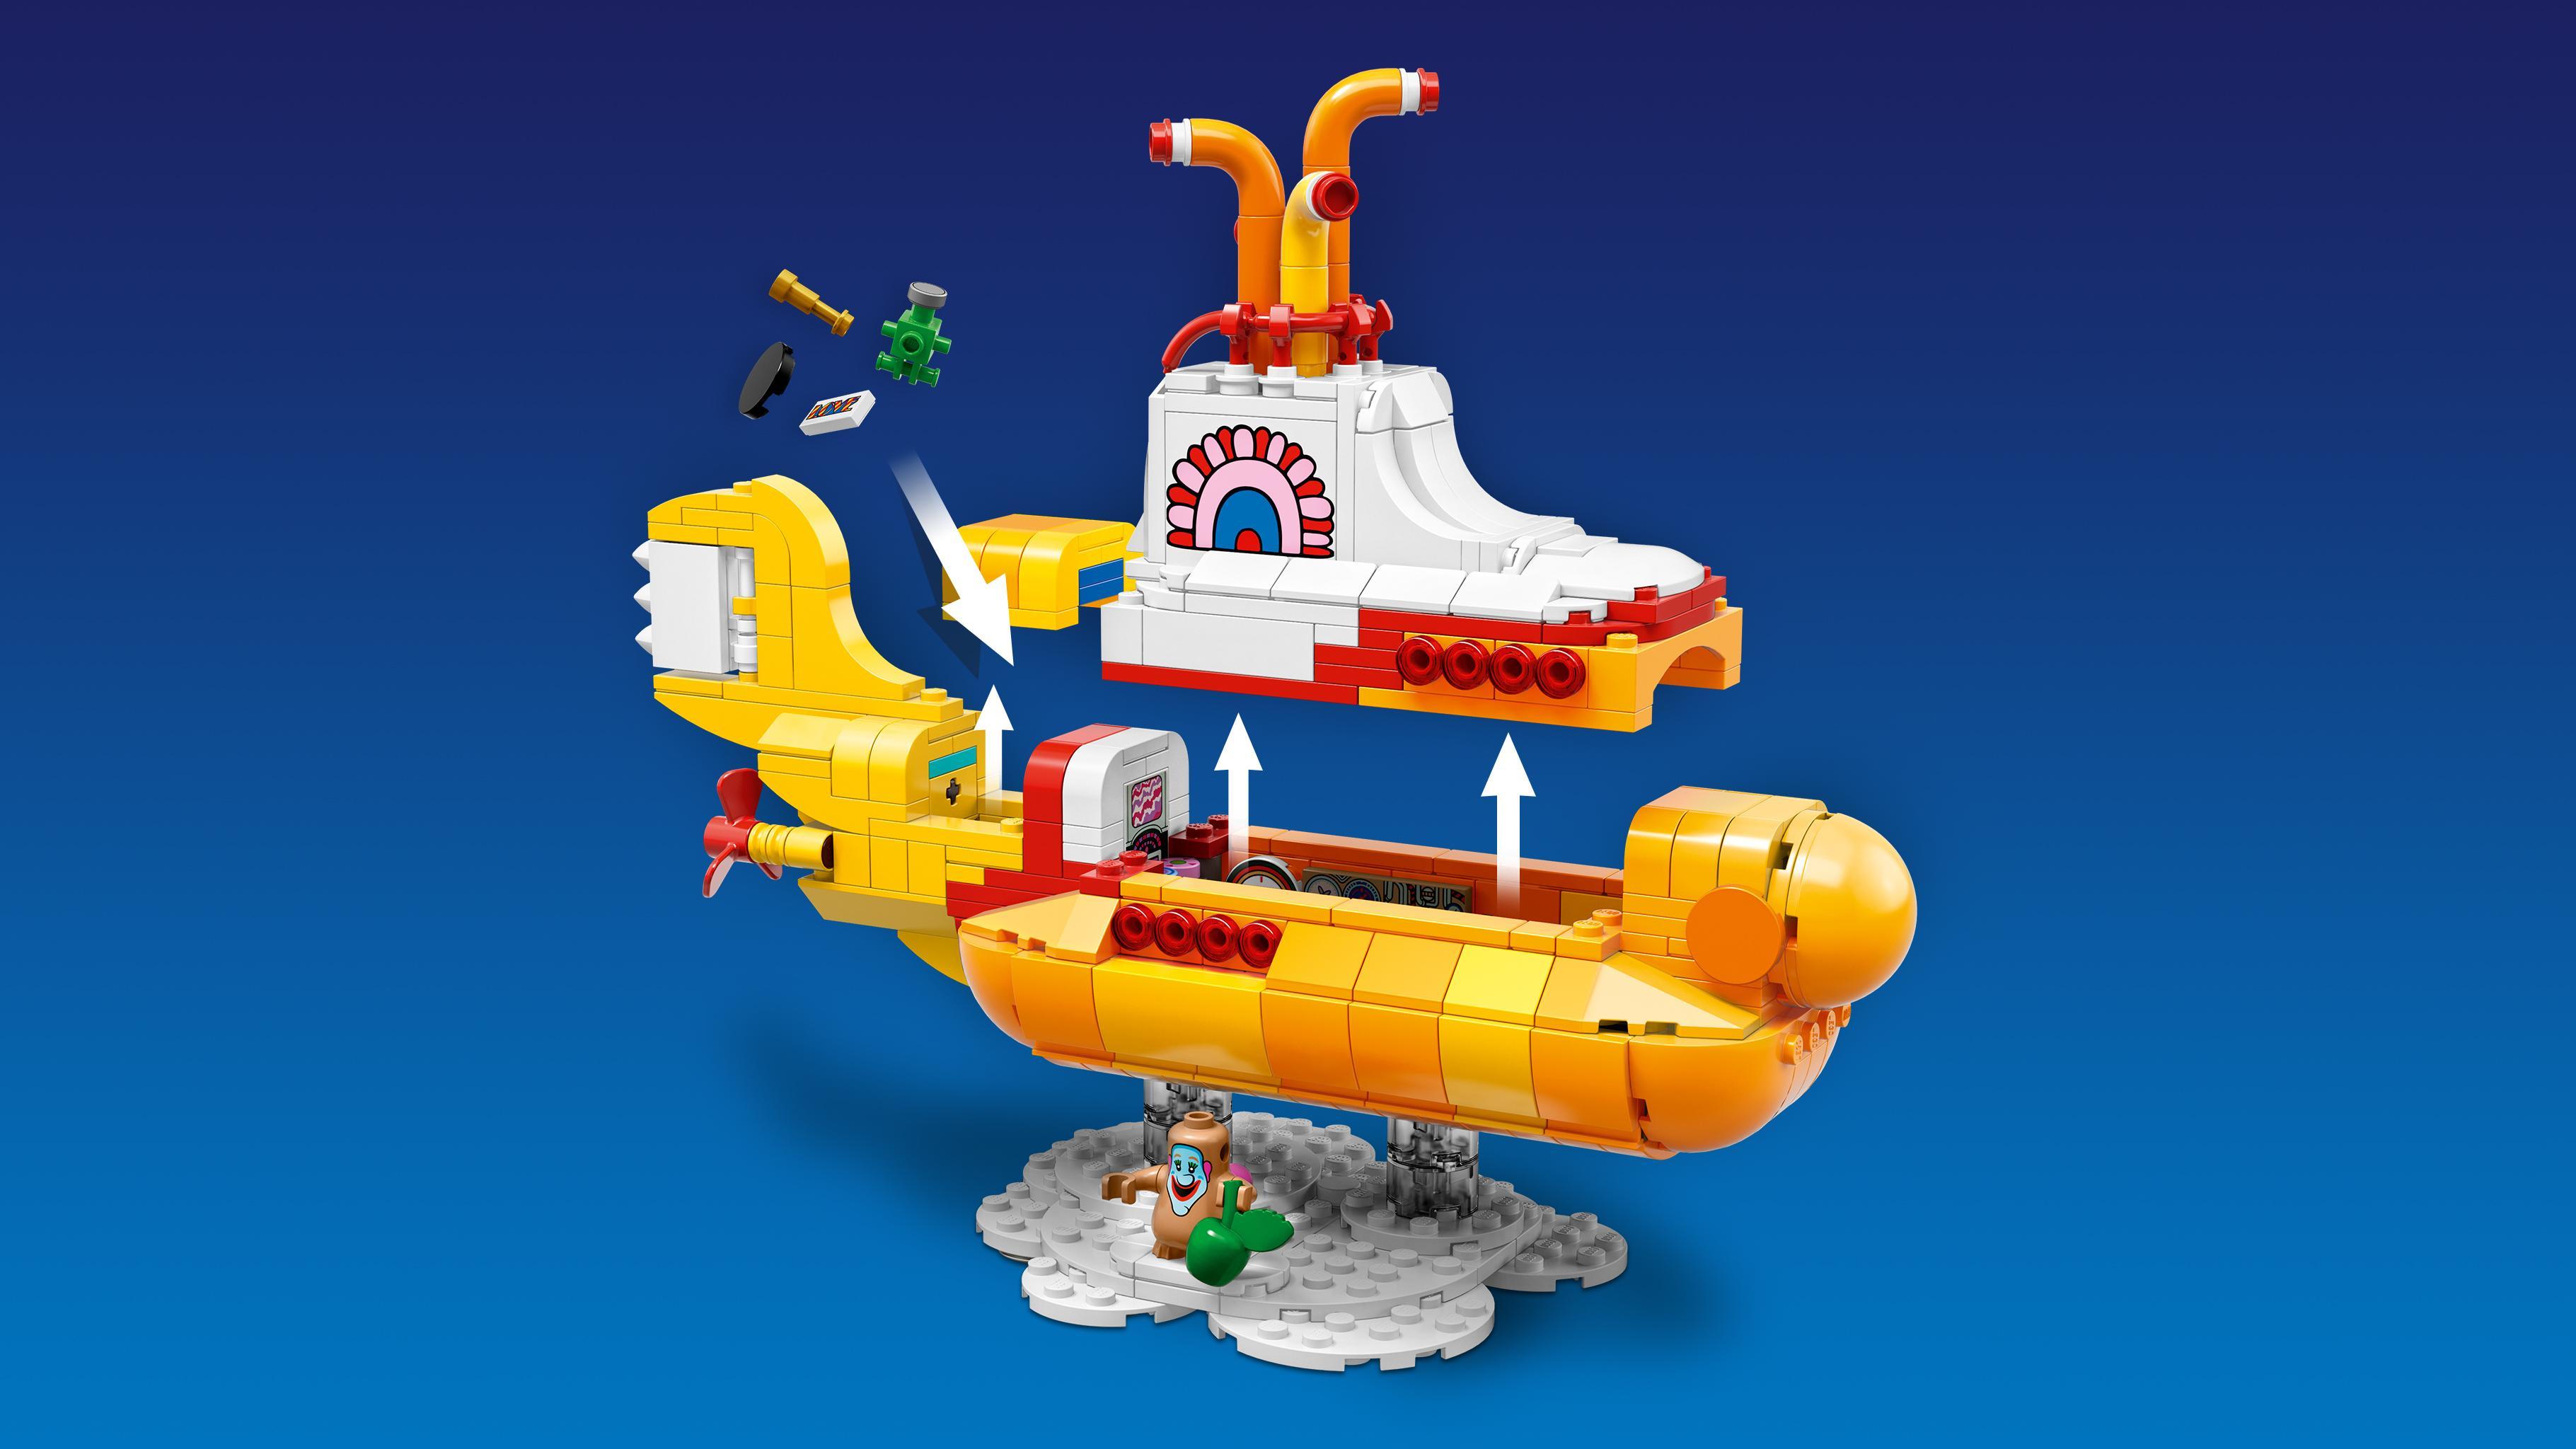 Amazon.com: LEGO Ideas 21306 Yellow Submarine Building Kit ...